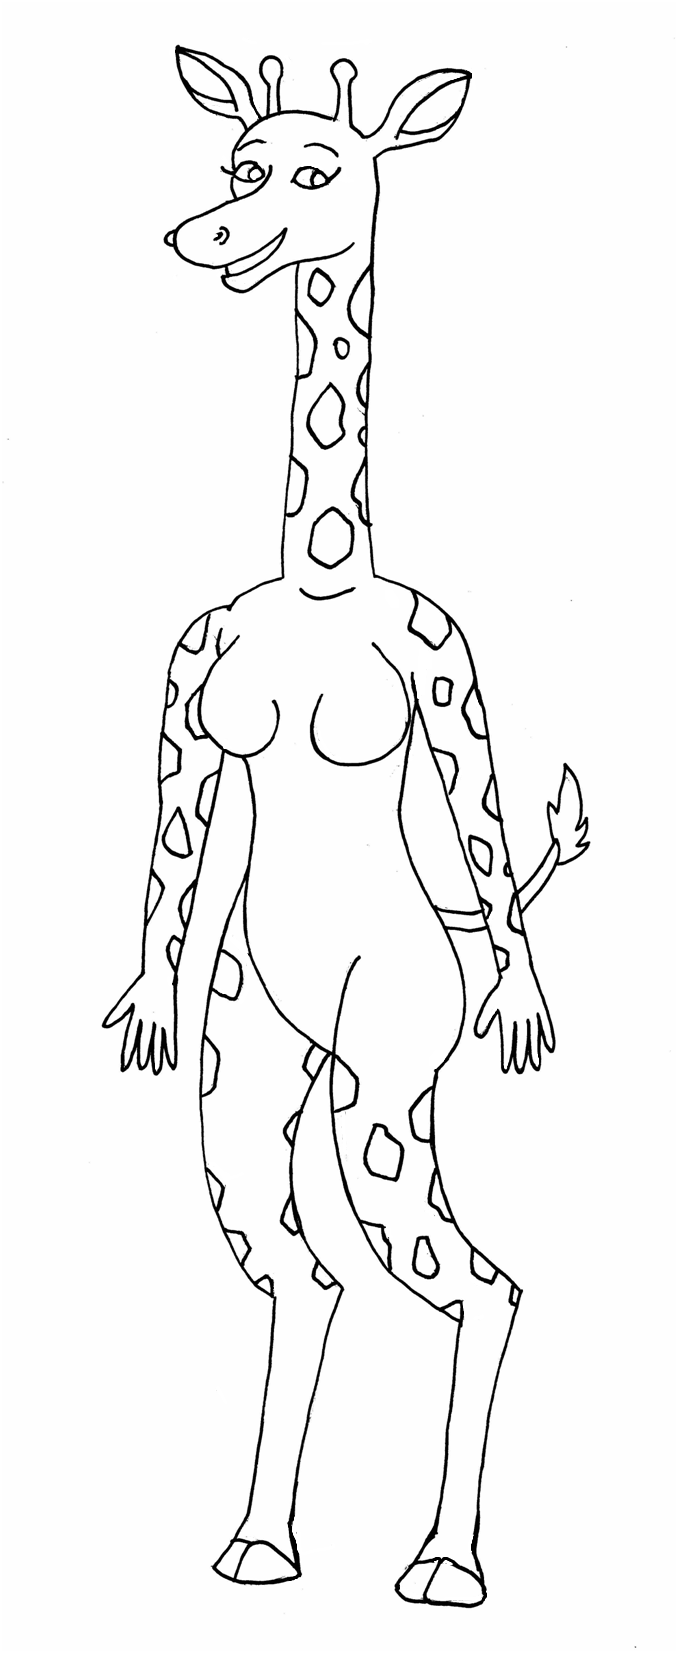 Giraffe girl with markings by QuestionUnicorn